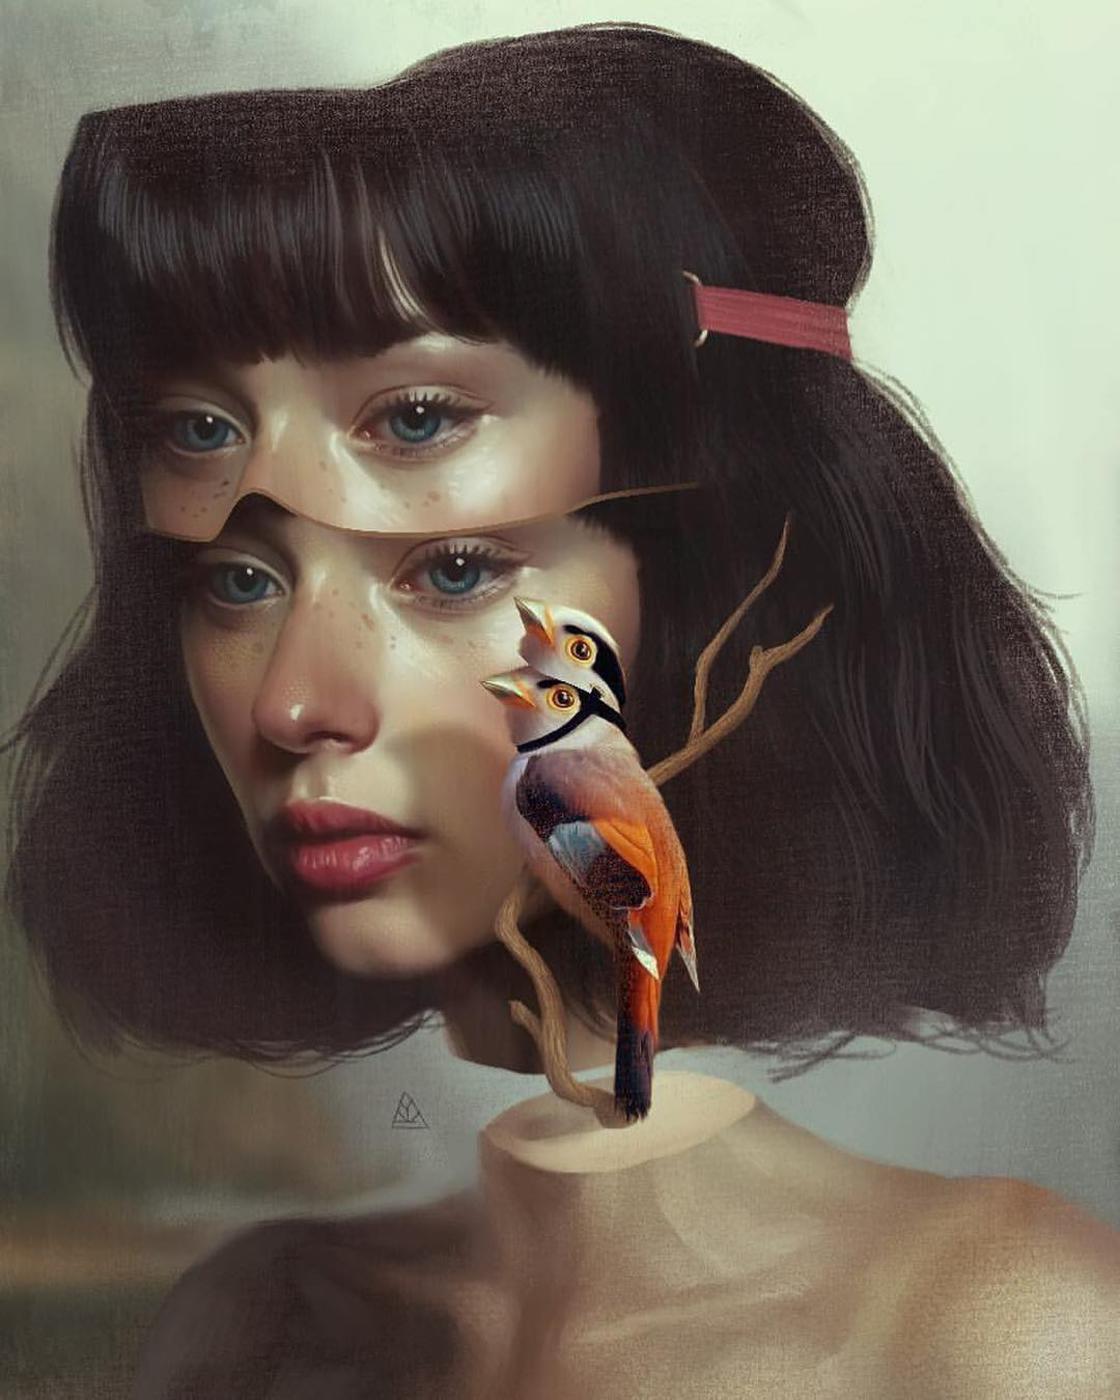 Dreamer – The latest surreal illustrations by Aykut Aydogdu